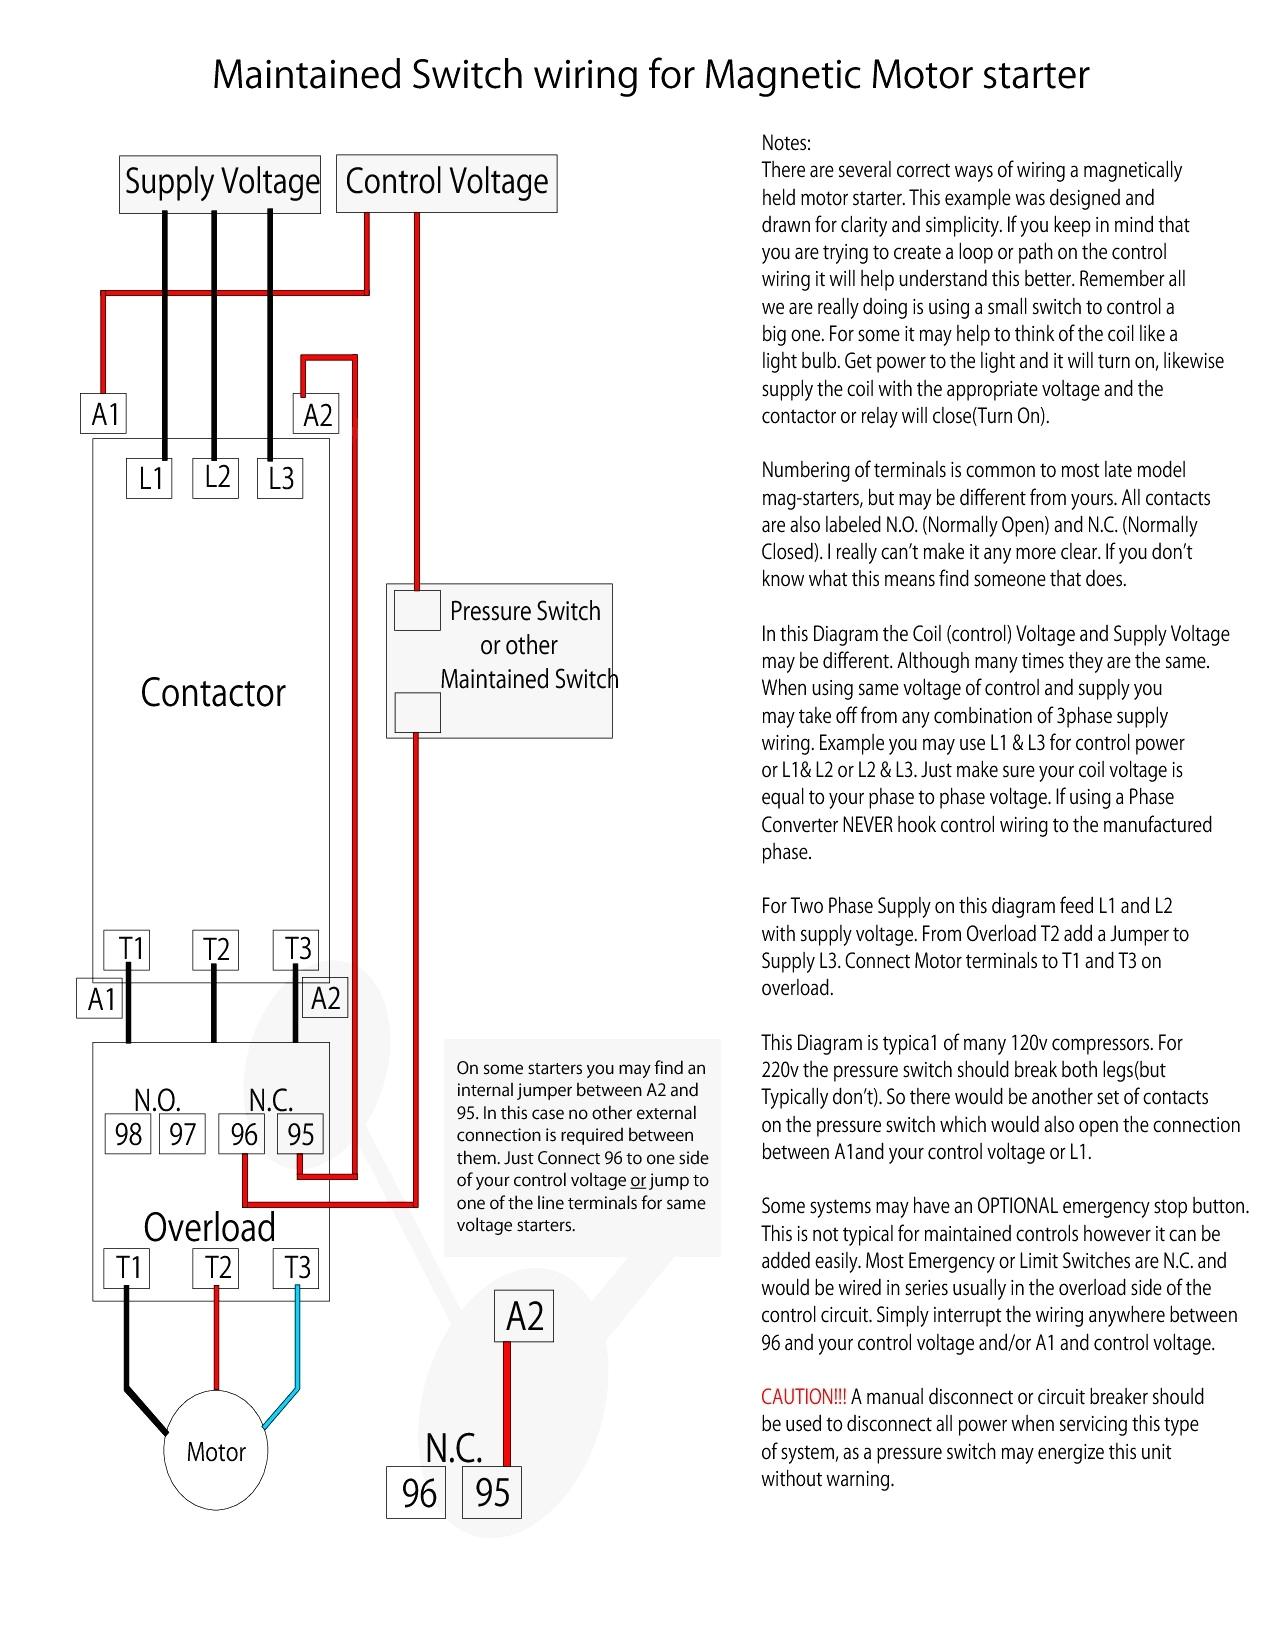 eaton contactor wiring diagram wiring diagram cutler hammer motor starter new cutler hammer contactor wiring diagram 9k jpg